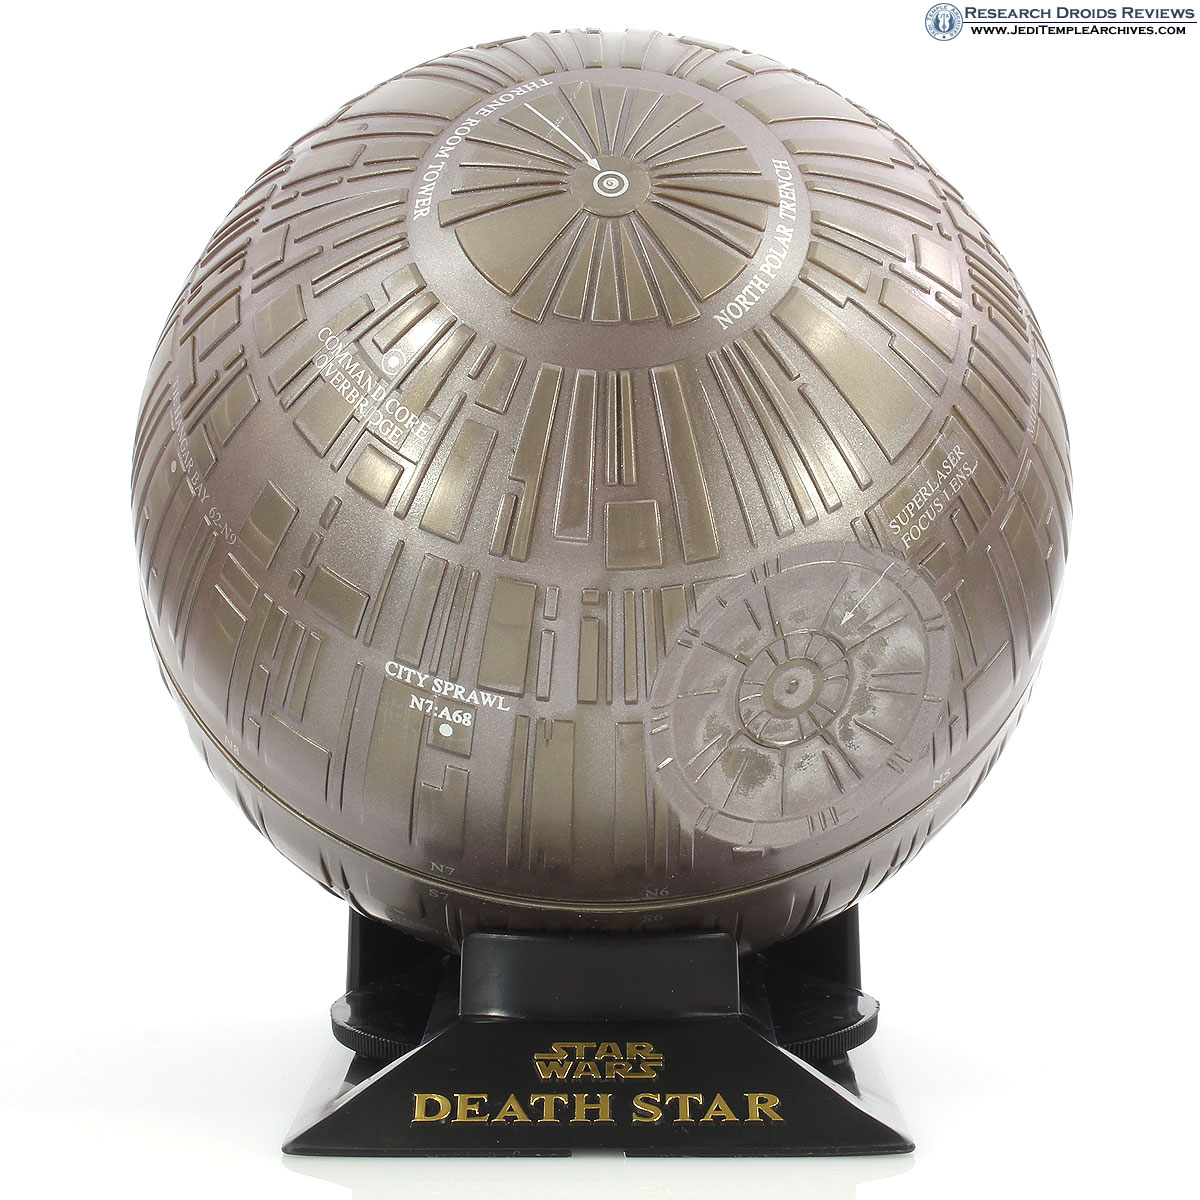 Death Star (with Darth Vader)